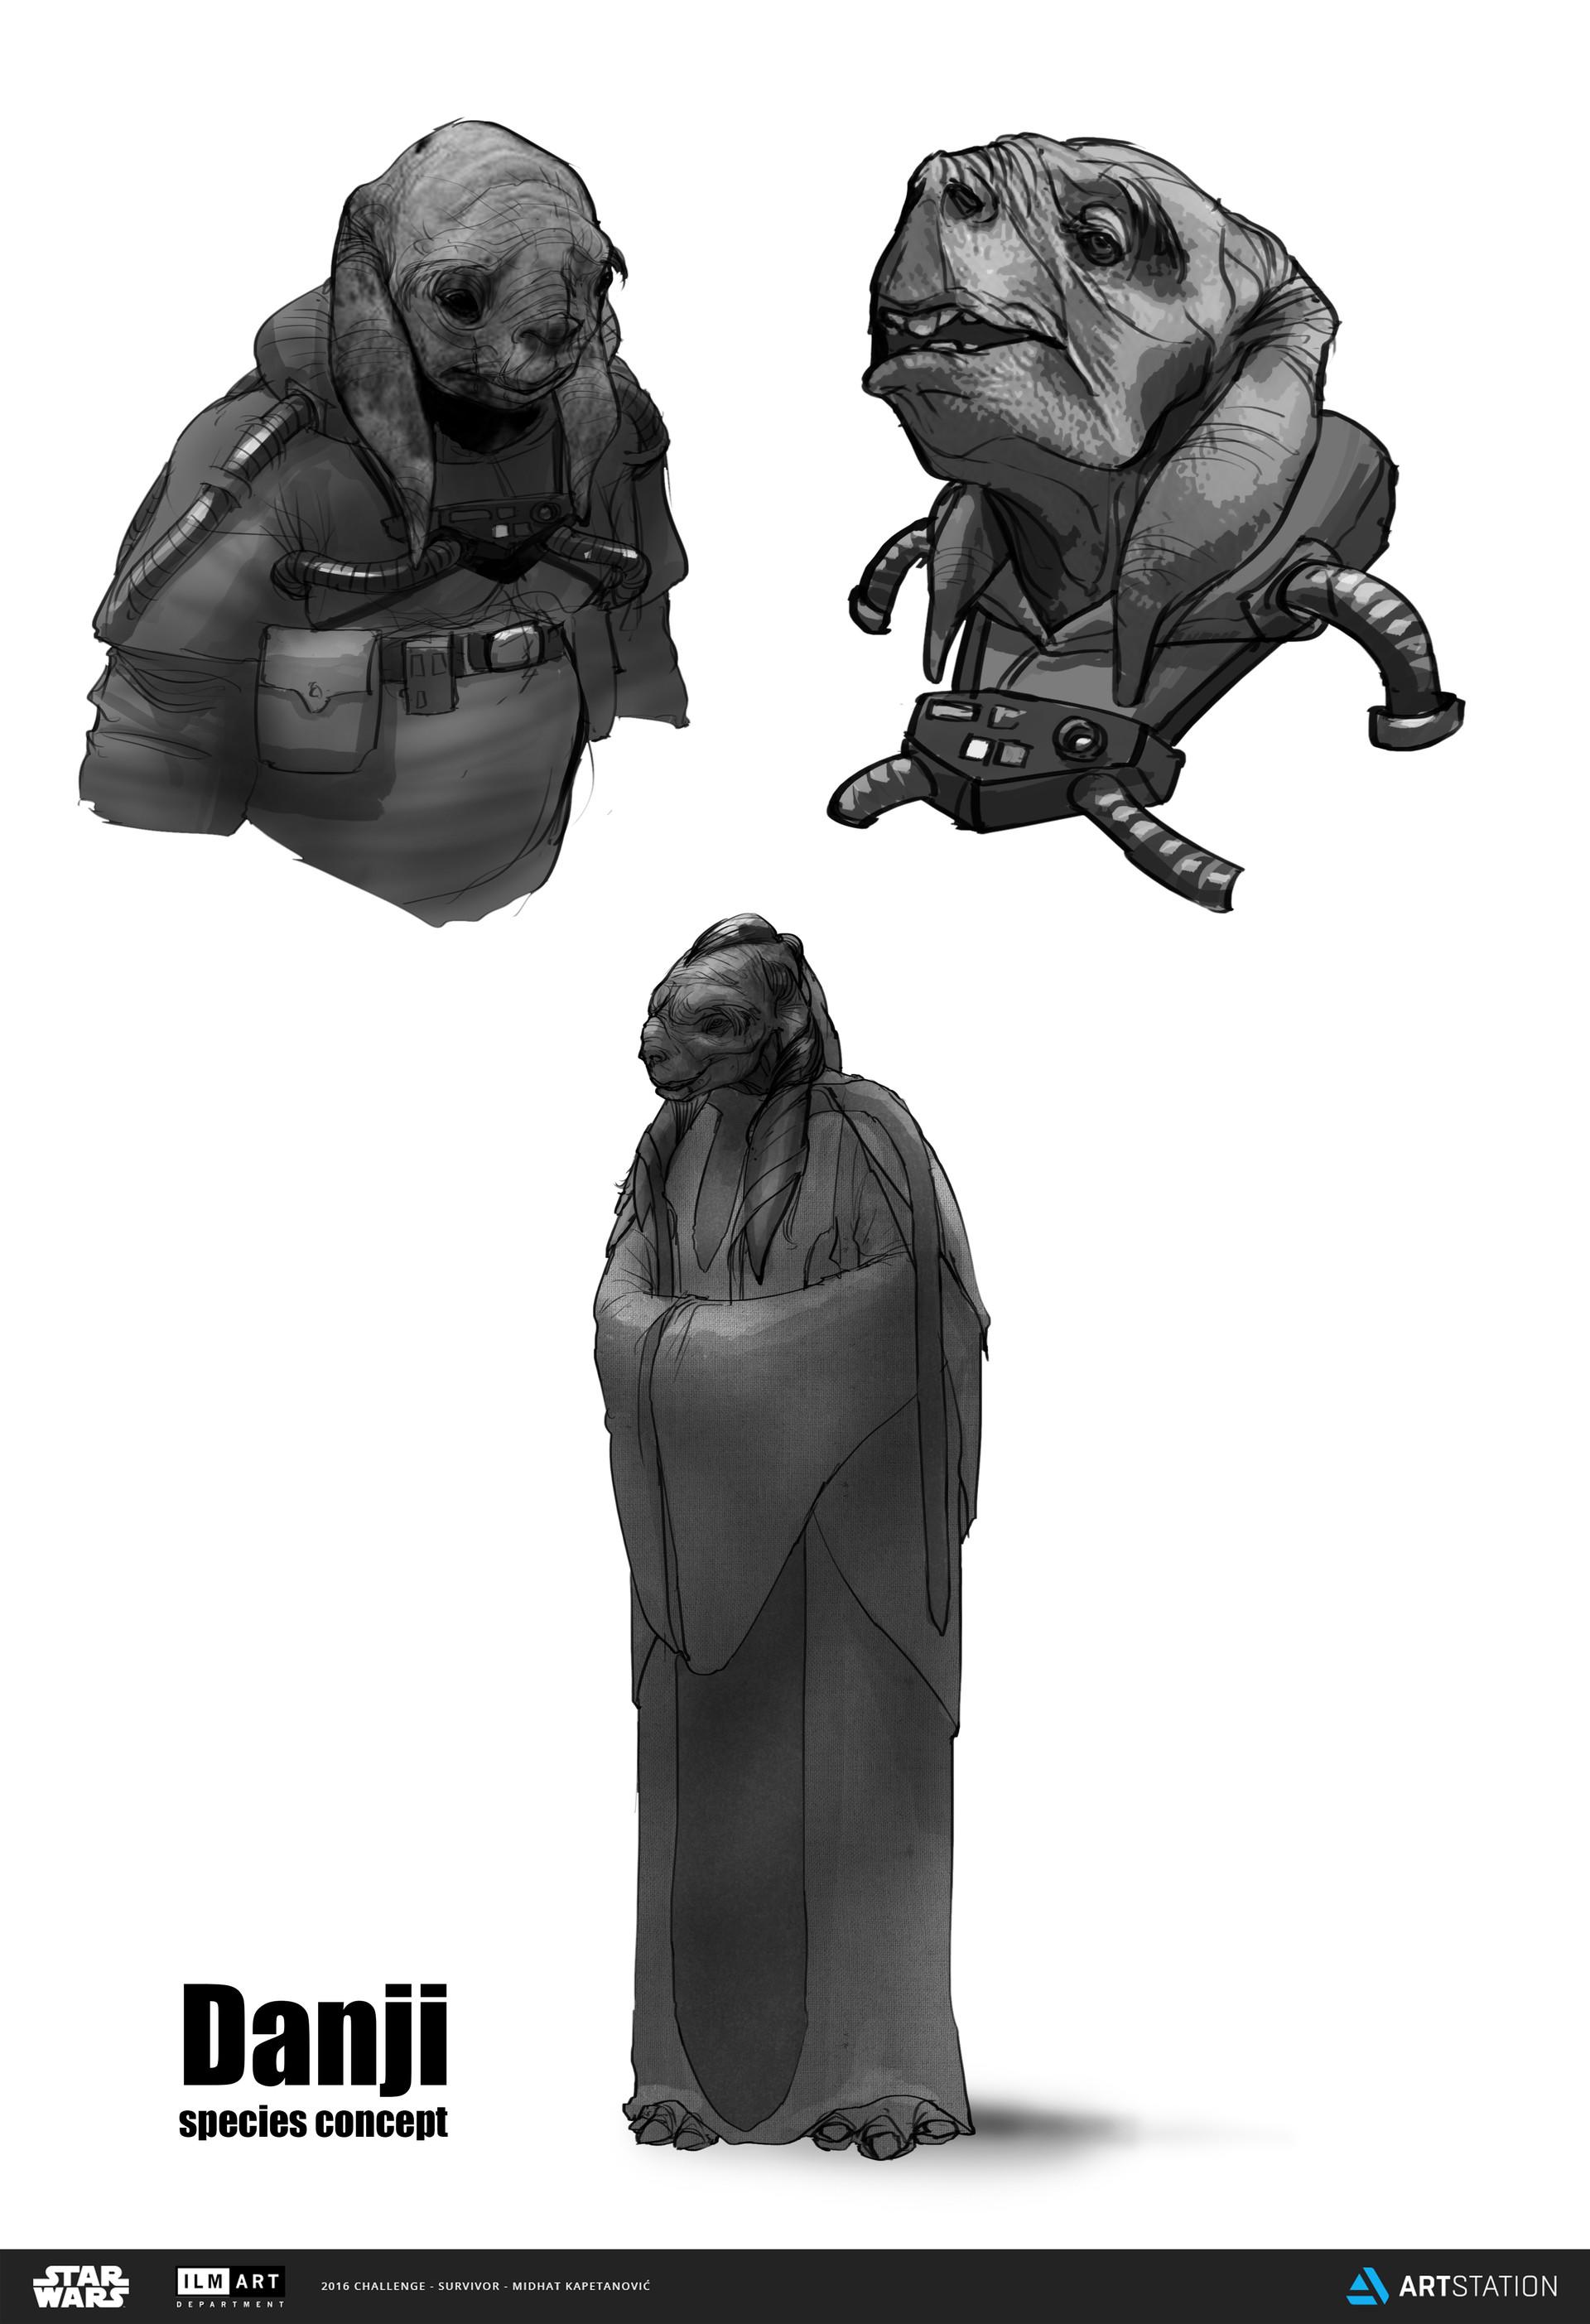 Midhat kapetanovic danji species concept 01a